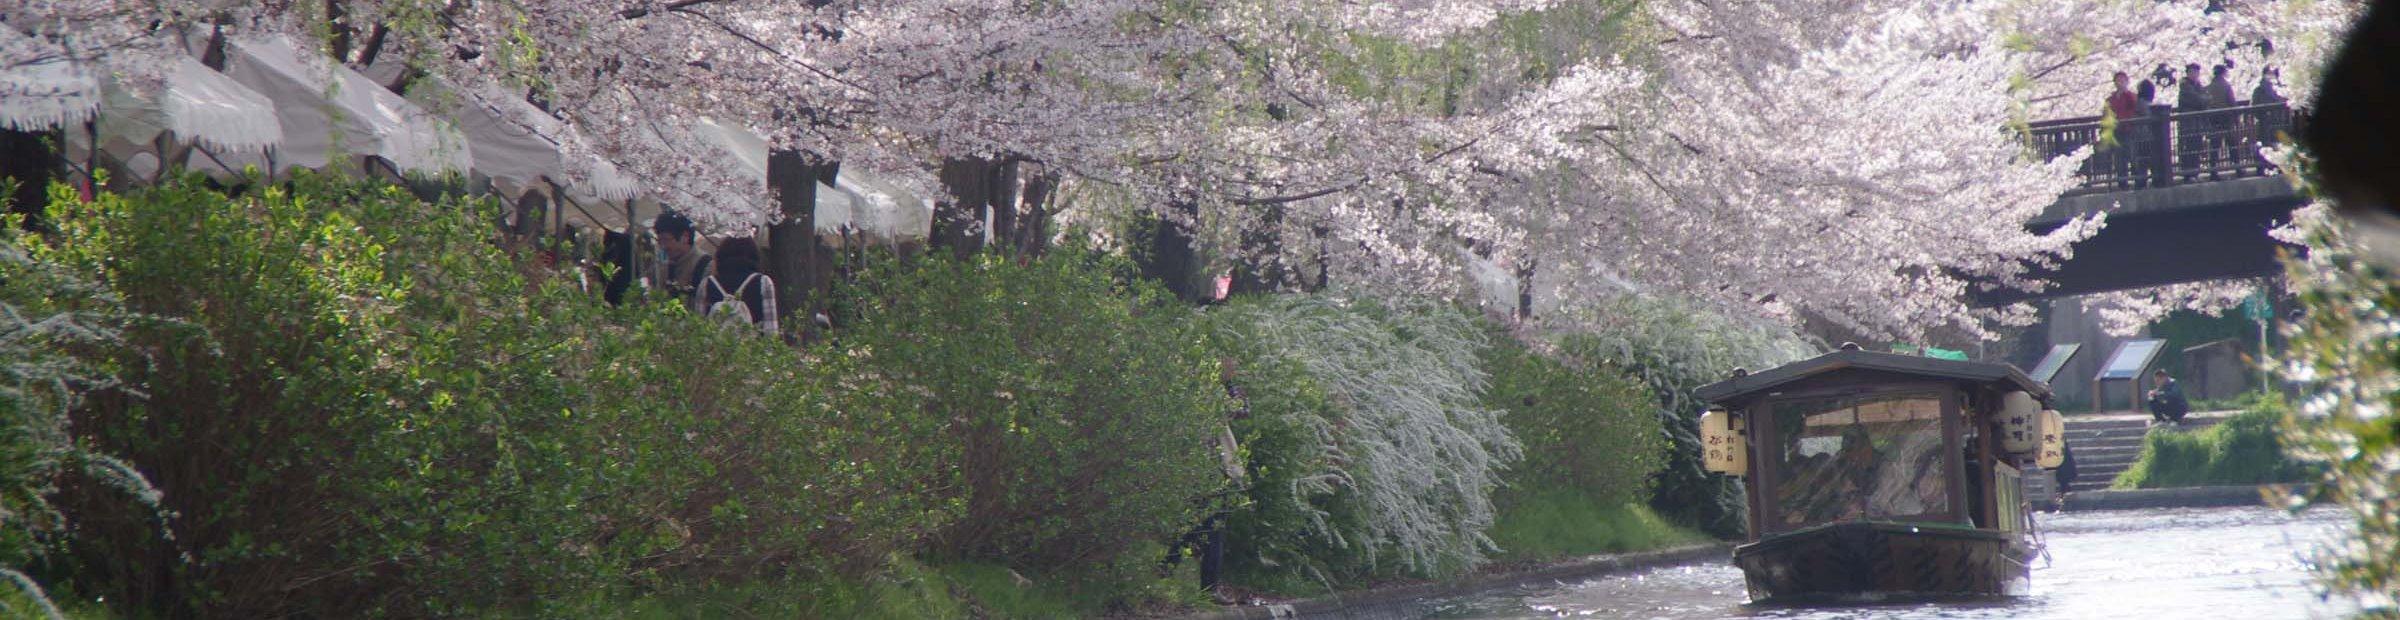 Cherry blossom in fushimi kyoto